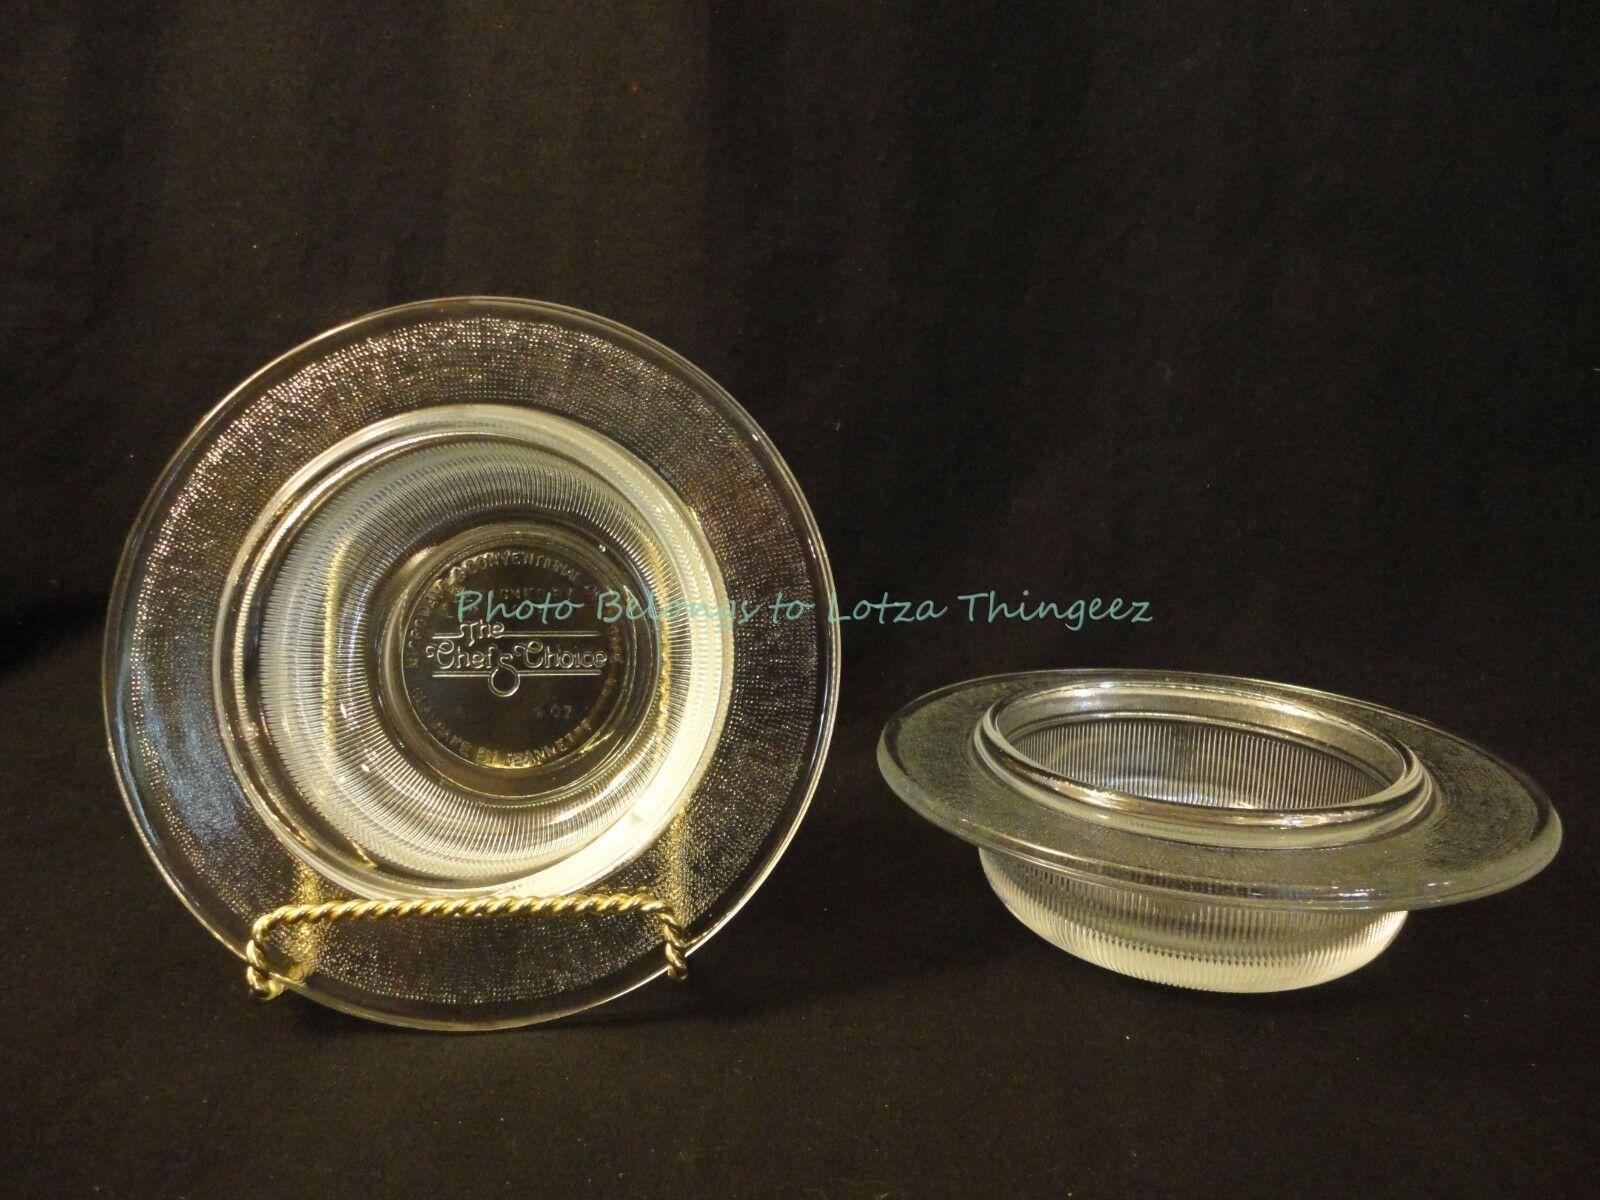 Vintage L&M Vignelli The Chef Choice 2 - Glasbake by Jeannette 9 Oz Bowls